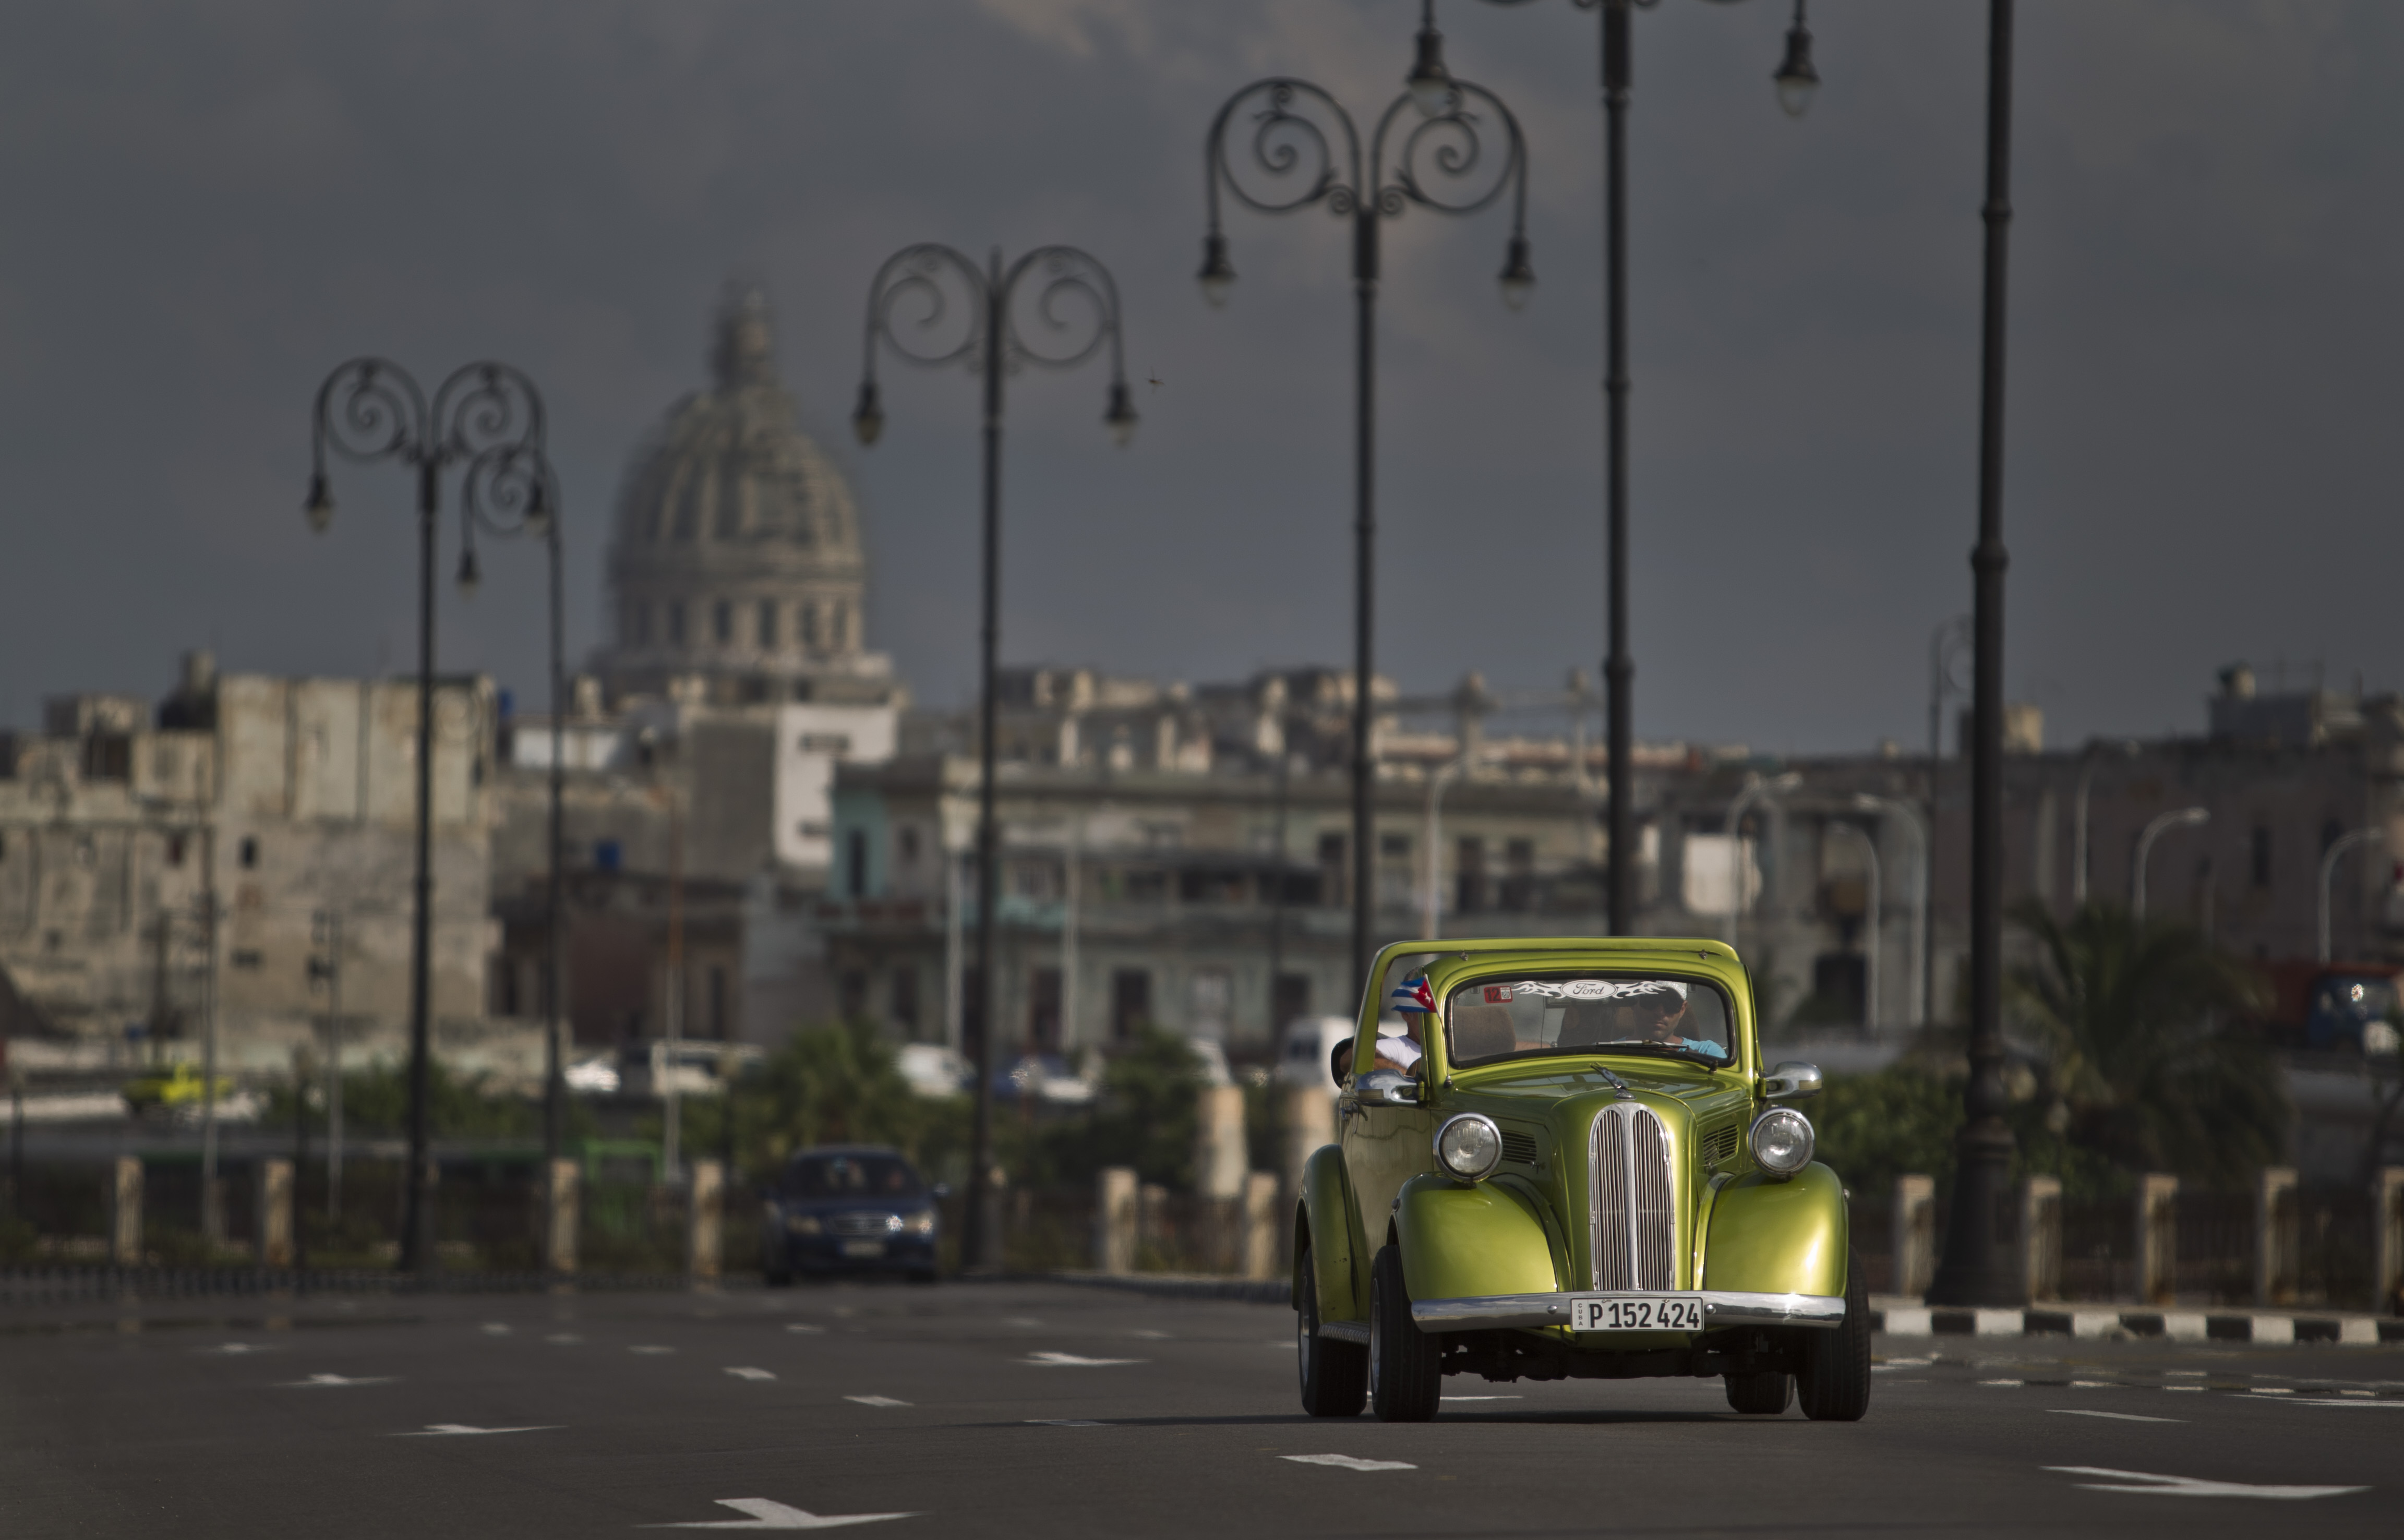 APTOPIX Cuba Classic Cars Photo Gallery